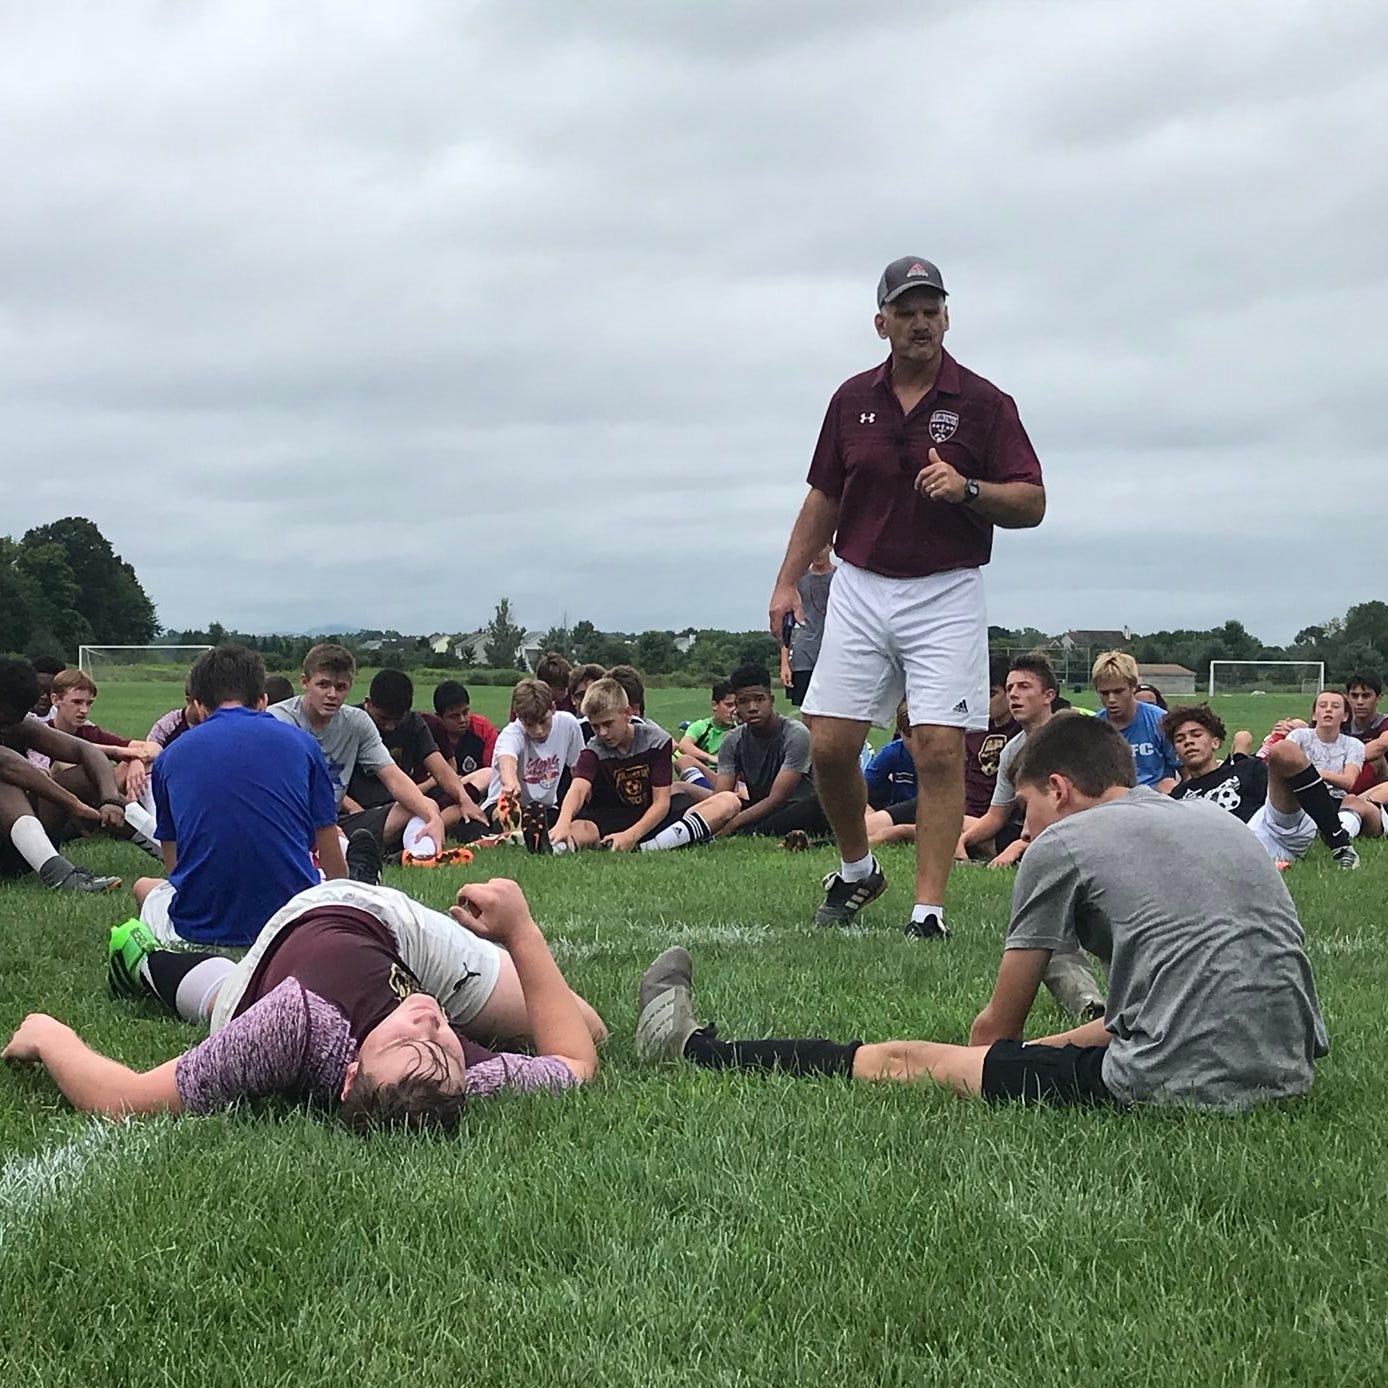 Arlington boys soccer: Three takeaways from practice